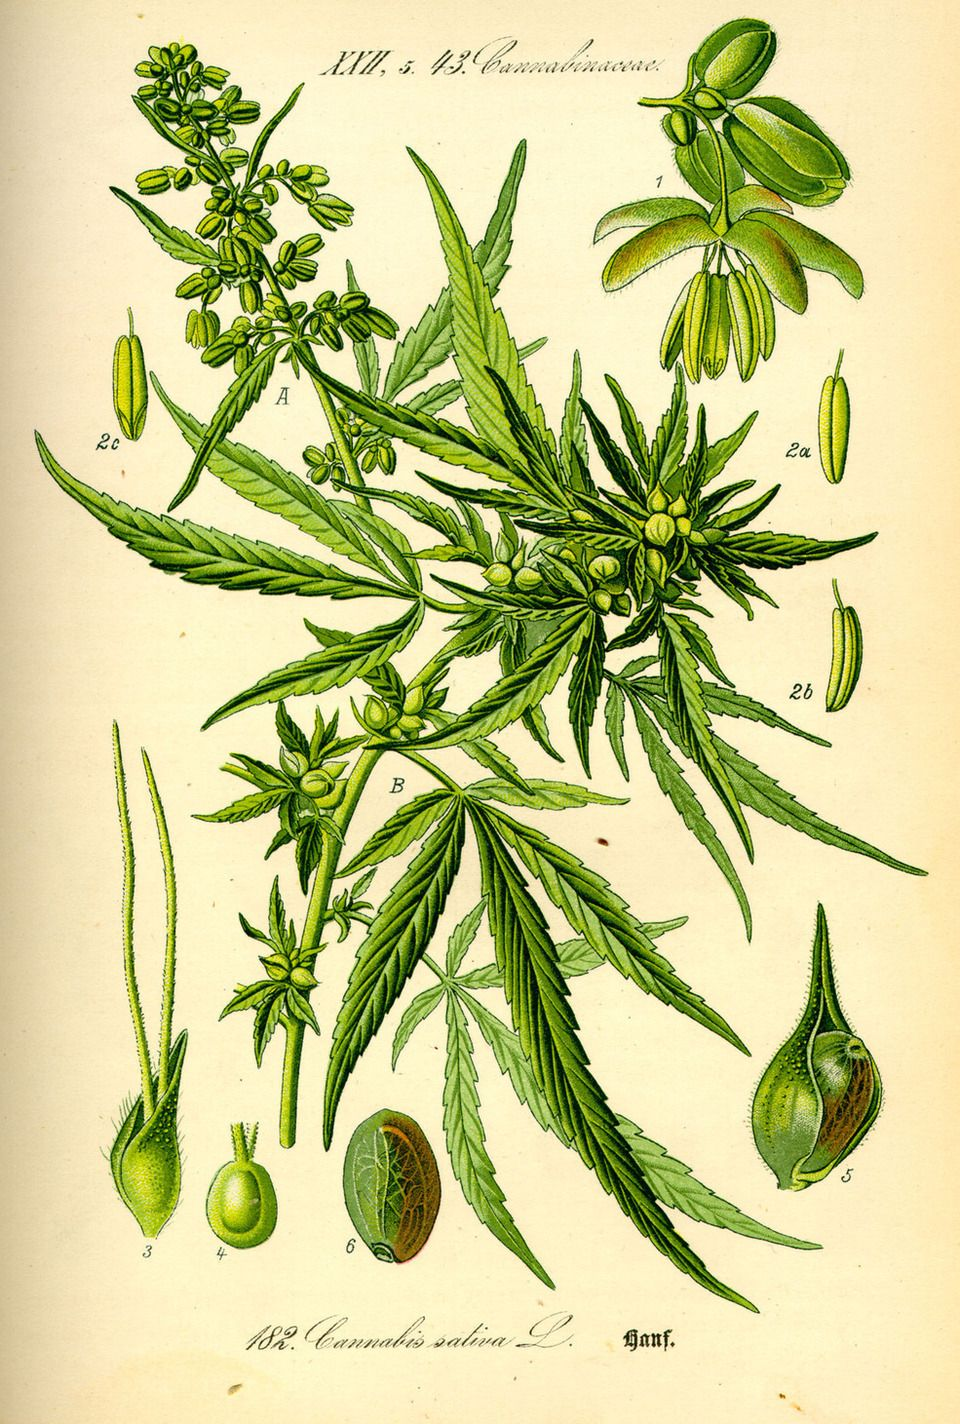 Cannabis Sativa | Expedición Botánica | Pinterest | Expedicion y Laminas